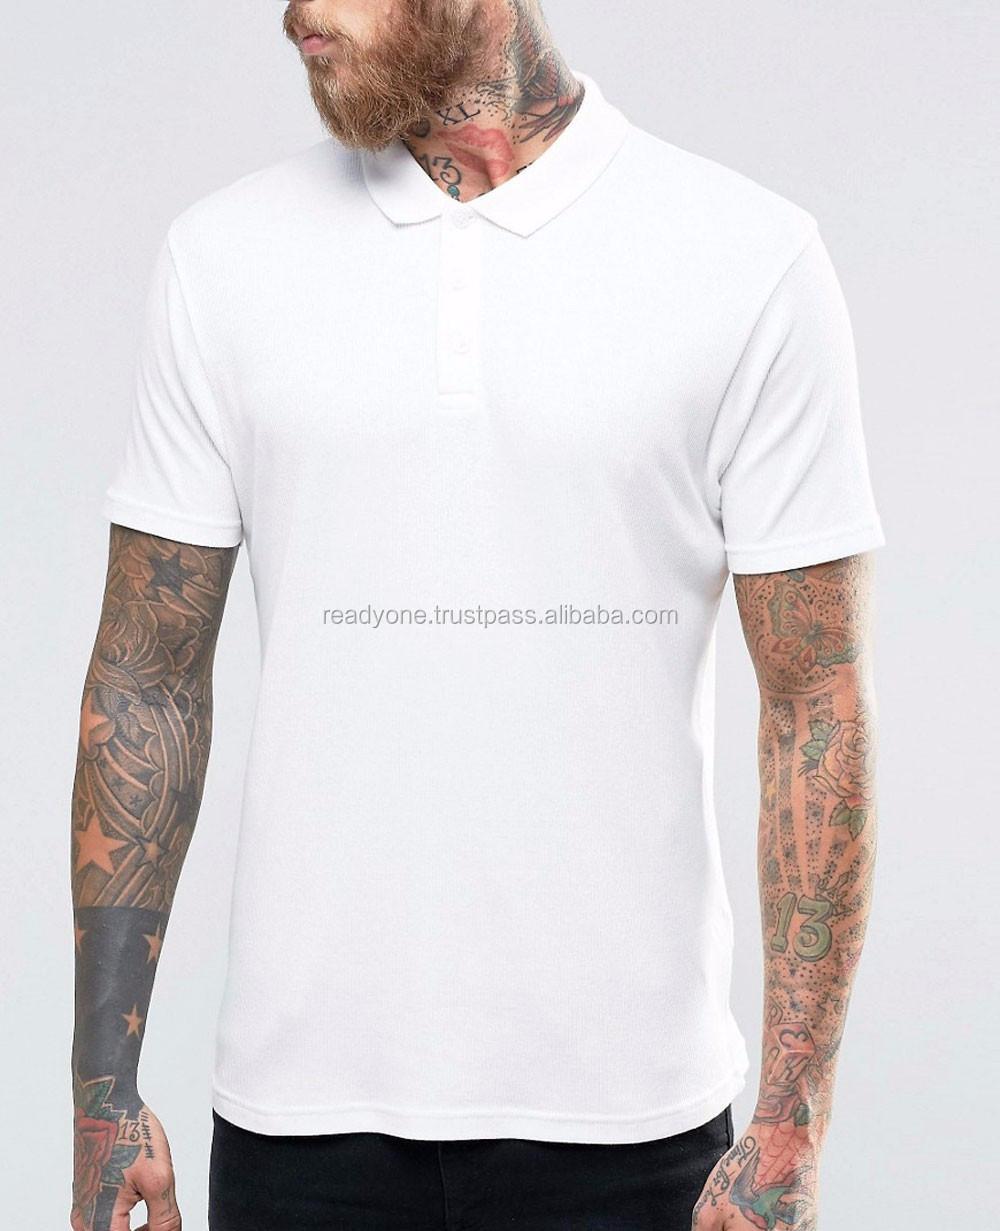 8d3fcc85d Wholesale Men brand t shirt for men polo t shirts vintage sports jerseys  golf tennis undershirts